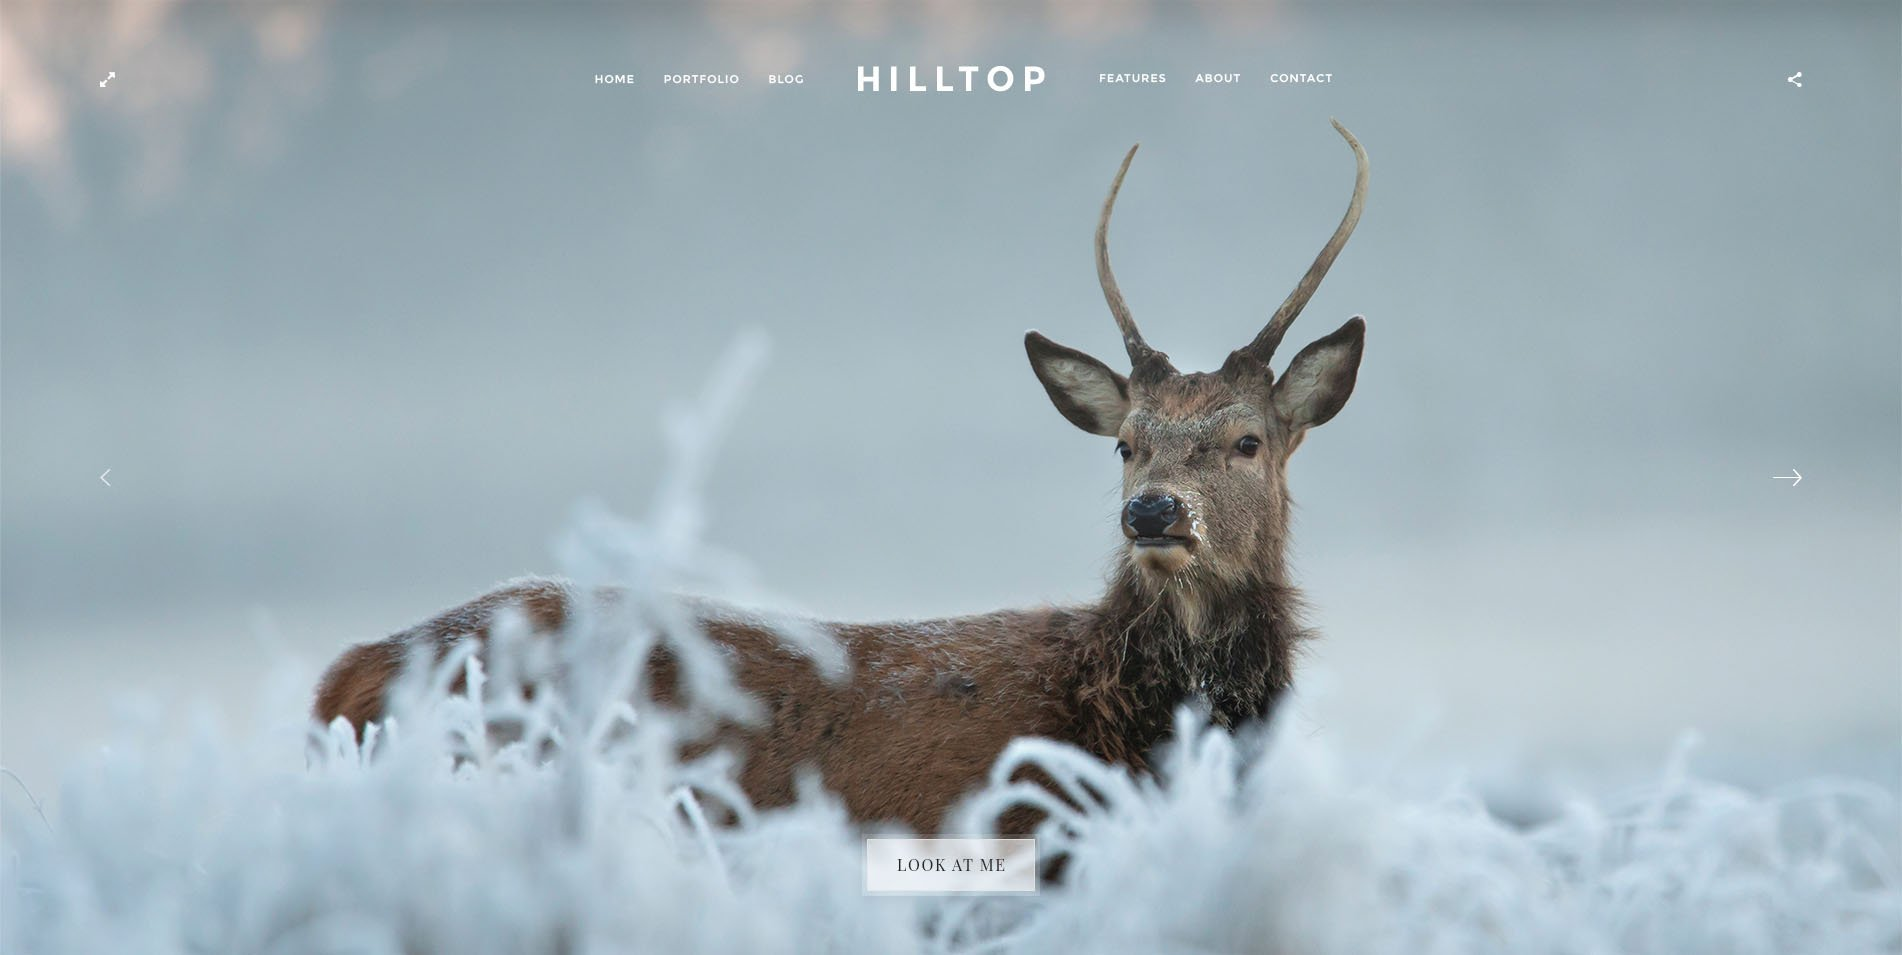 Hilltop 8